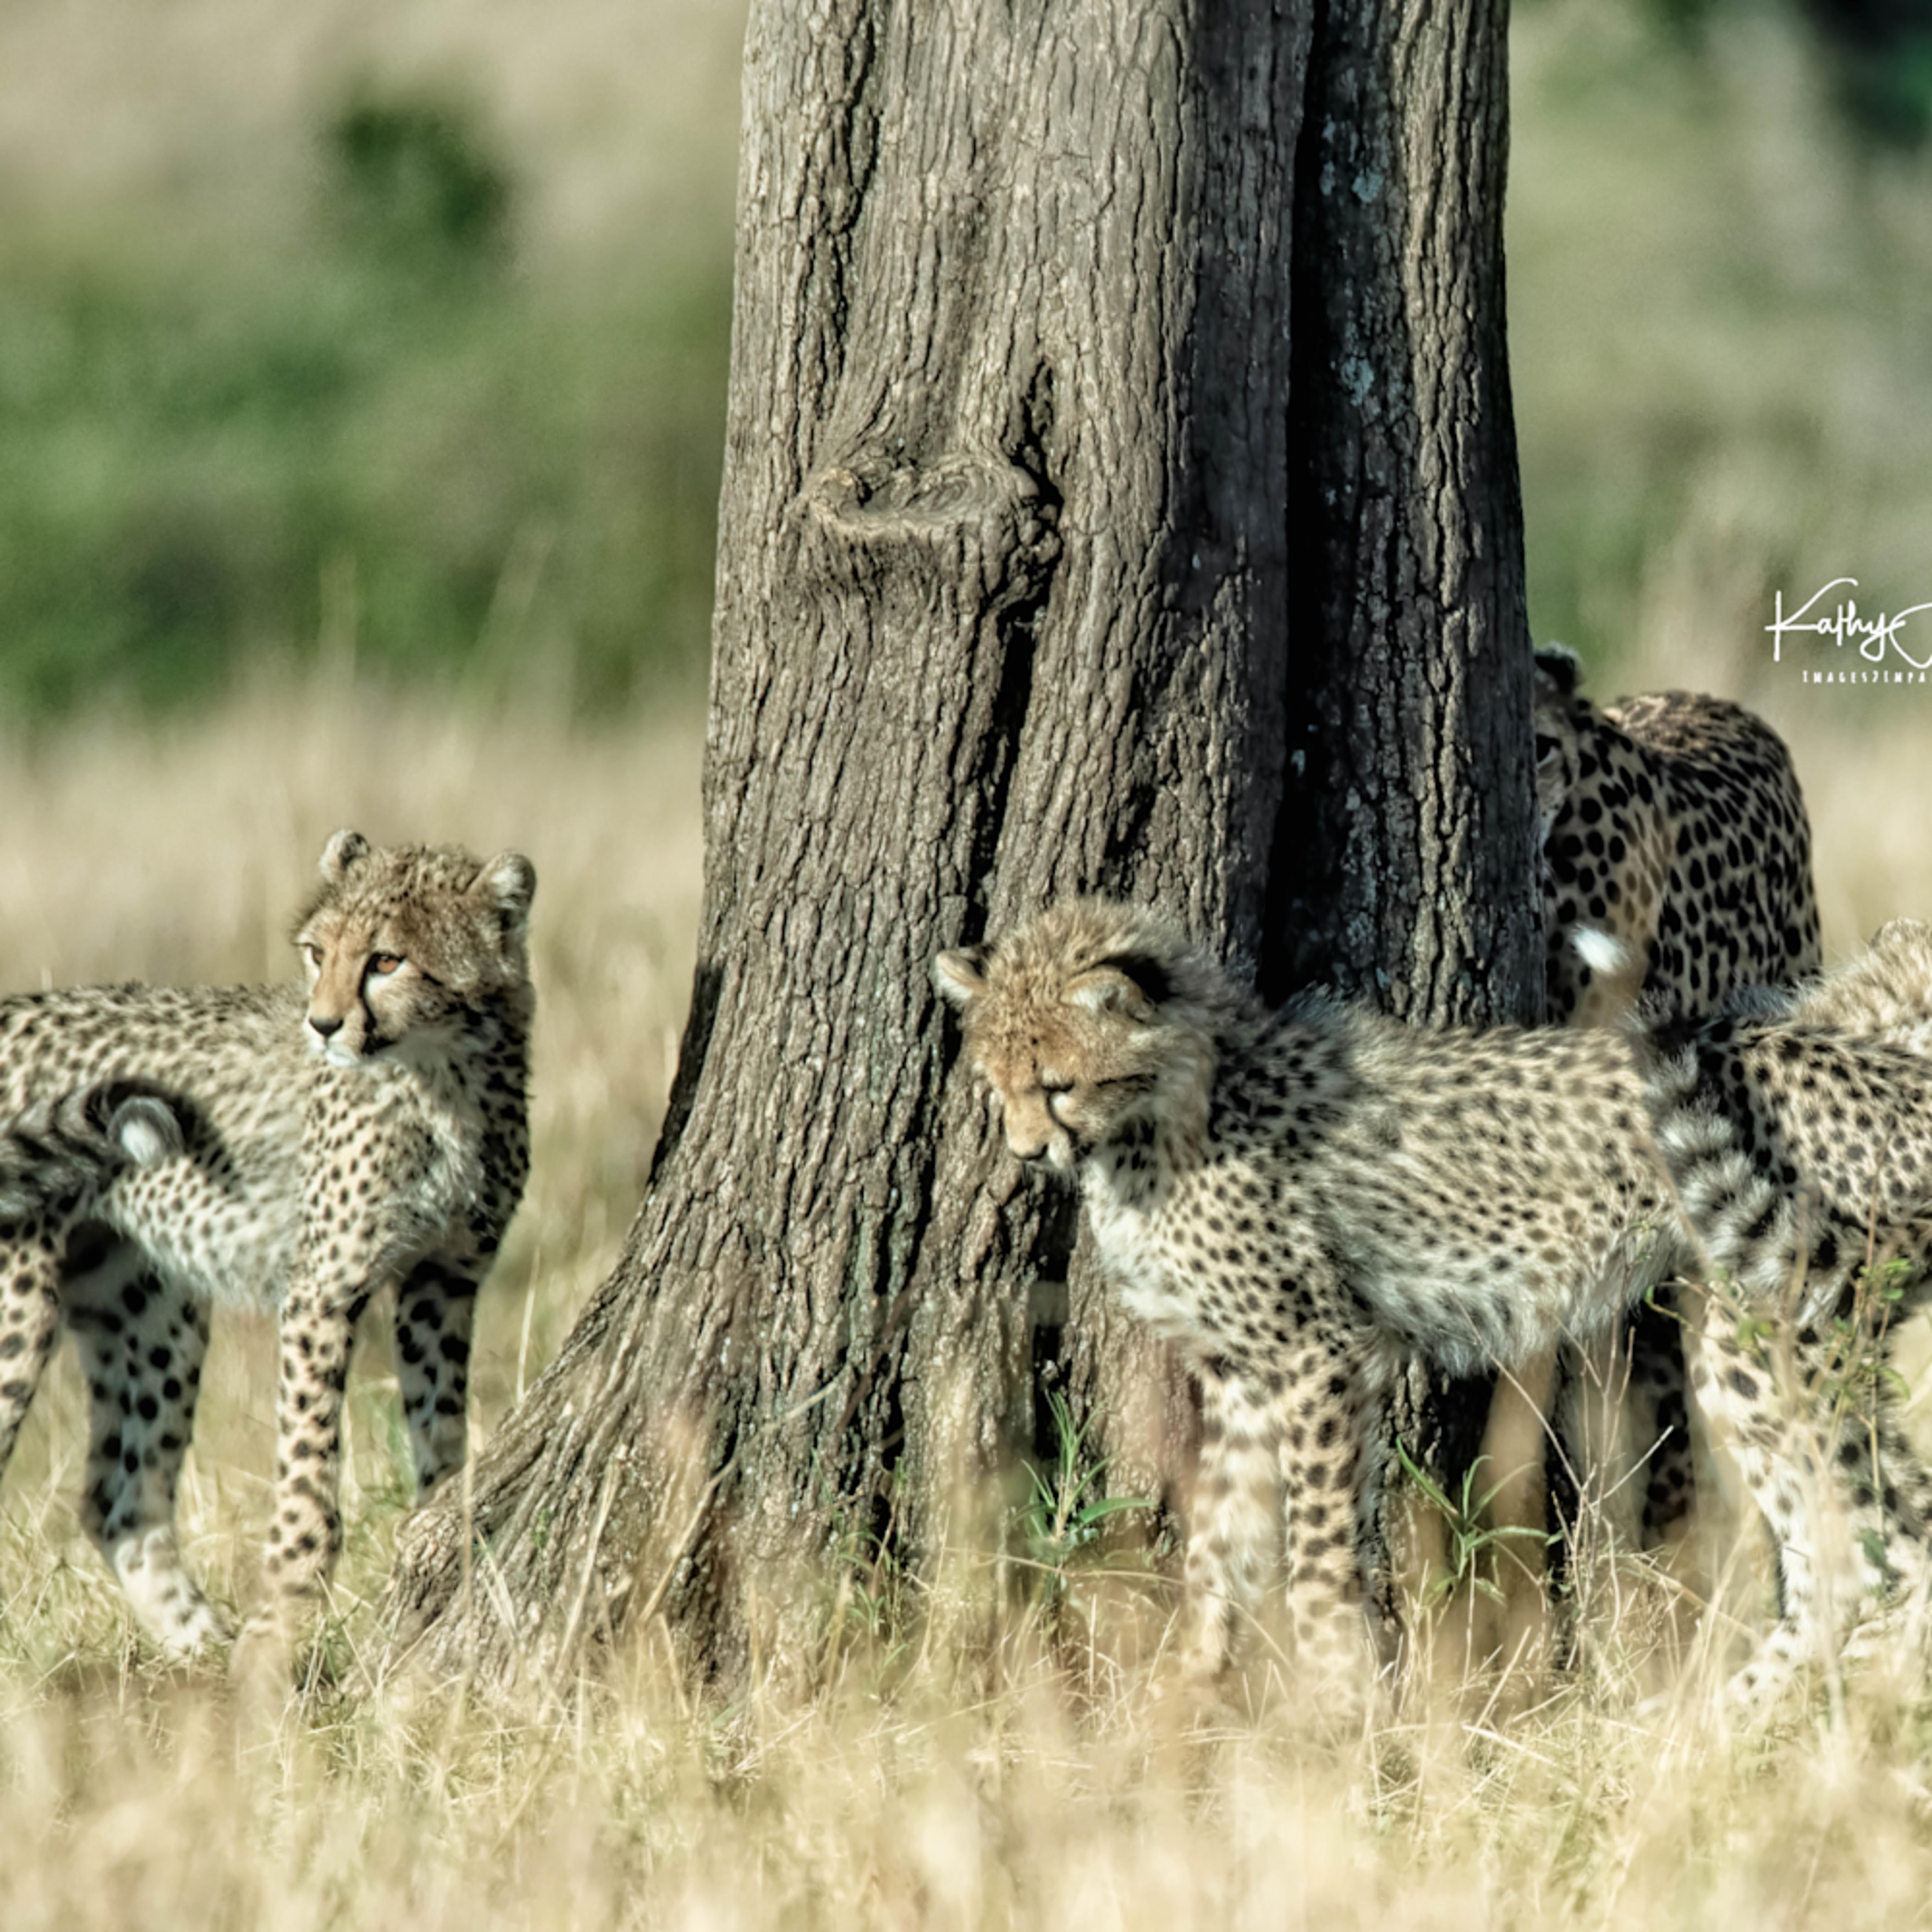 Kenya cheetah 3955 twczem